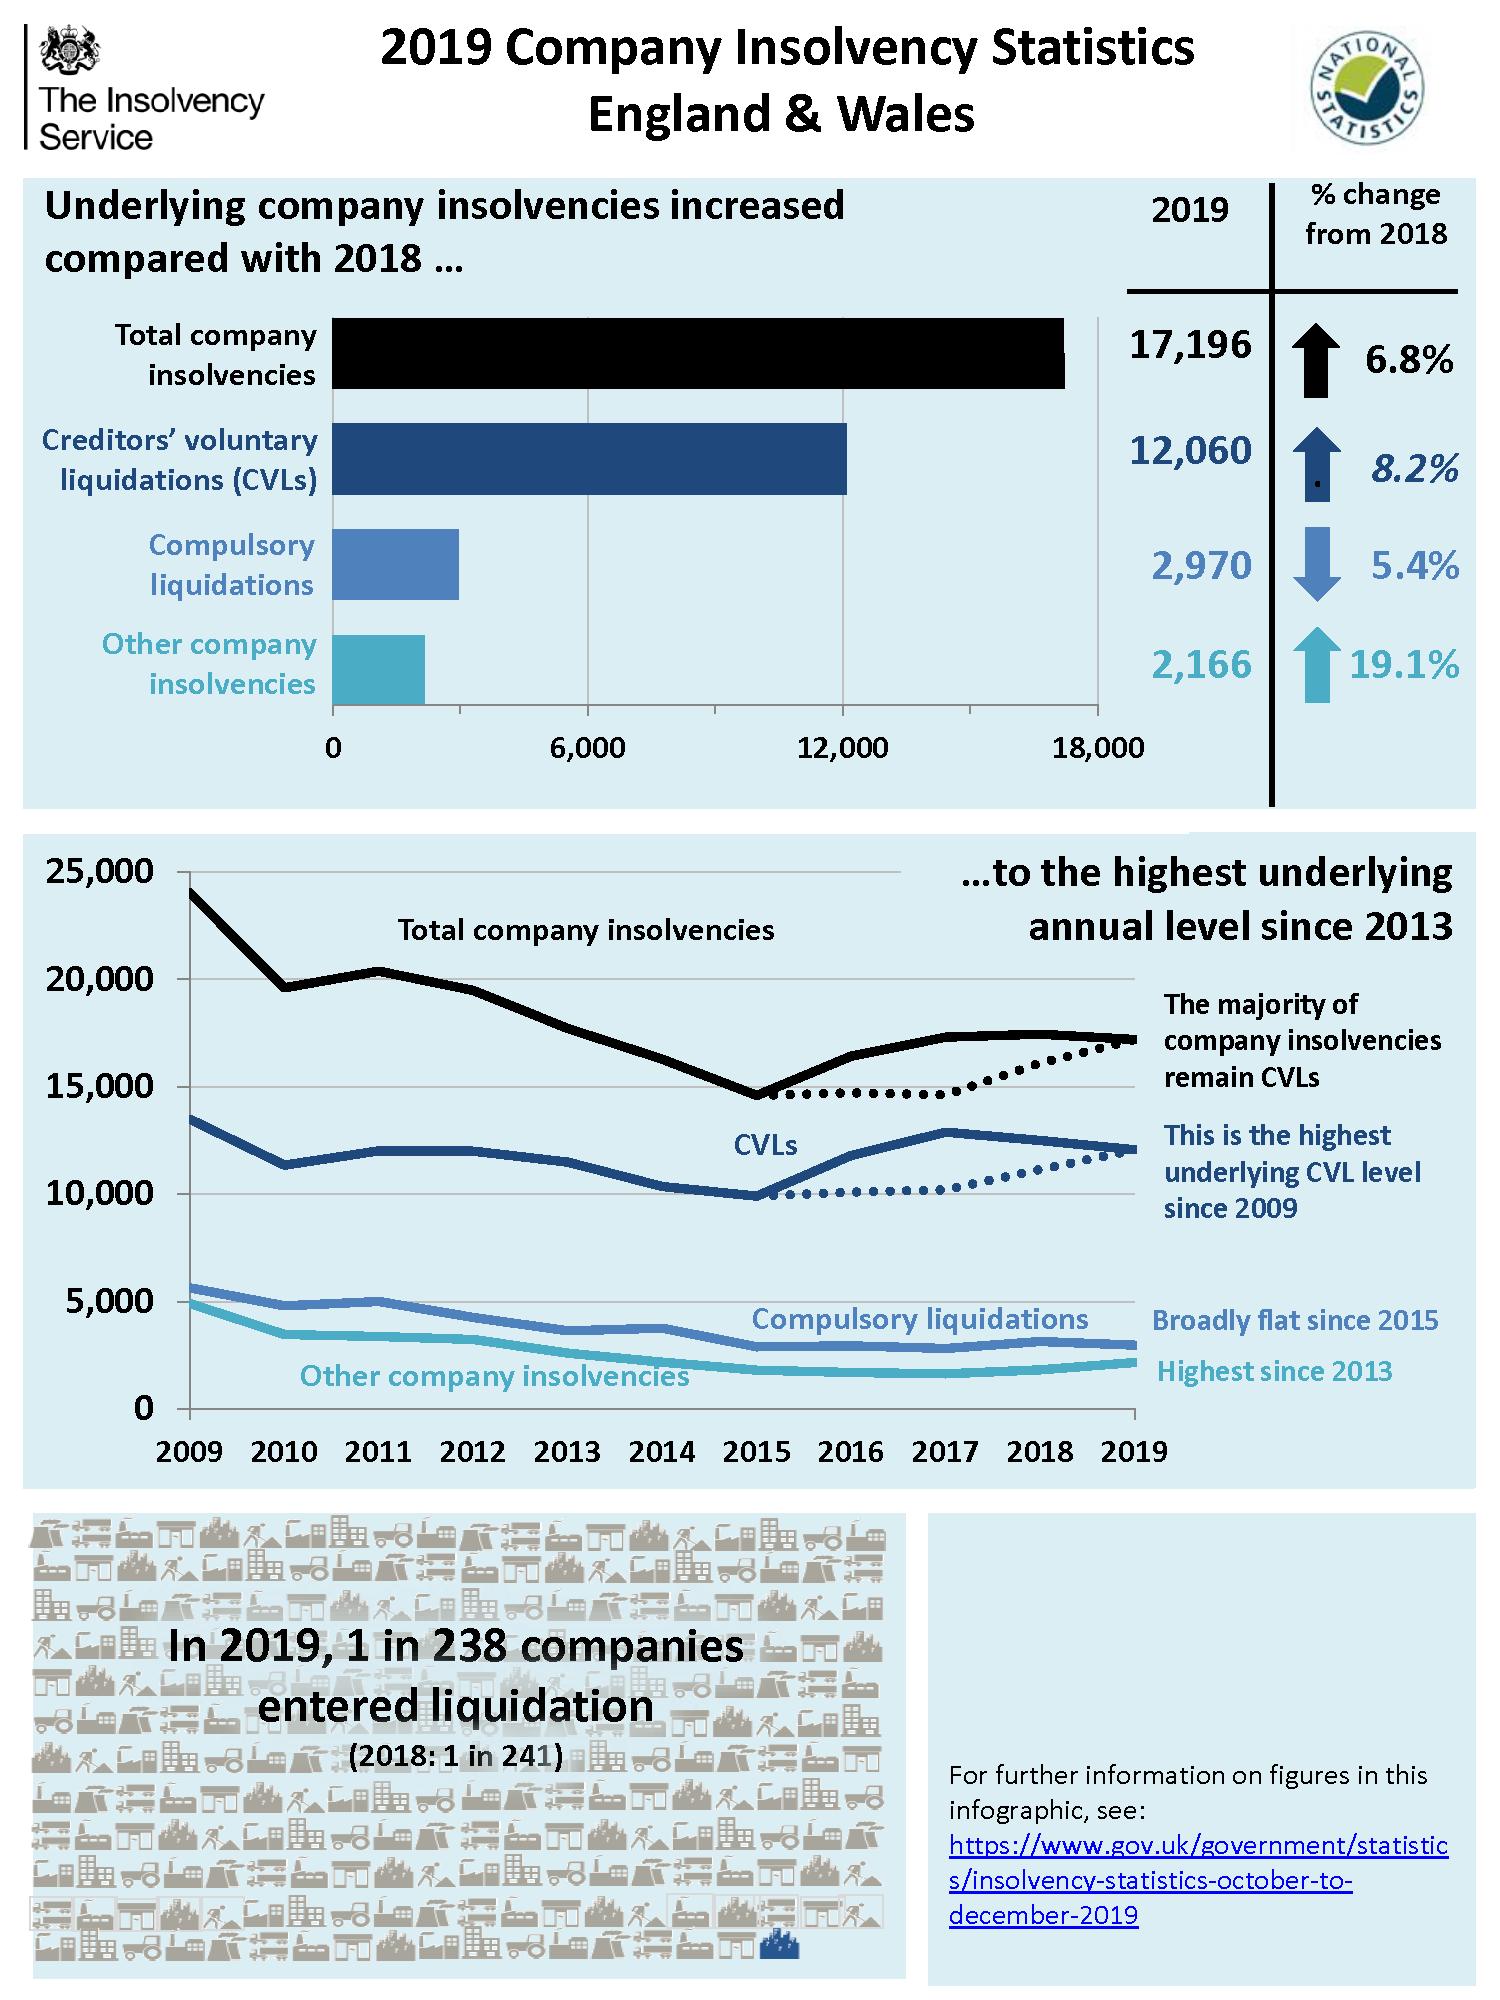 Q2 2019 Company Insolvency Statistics